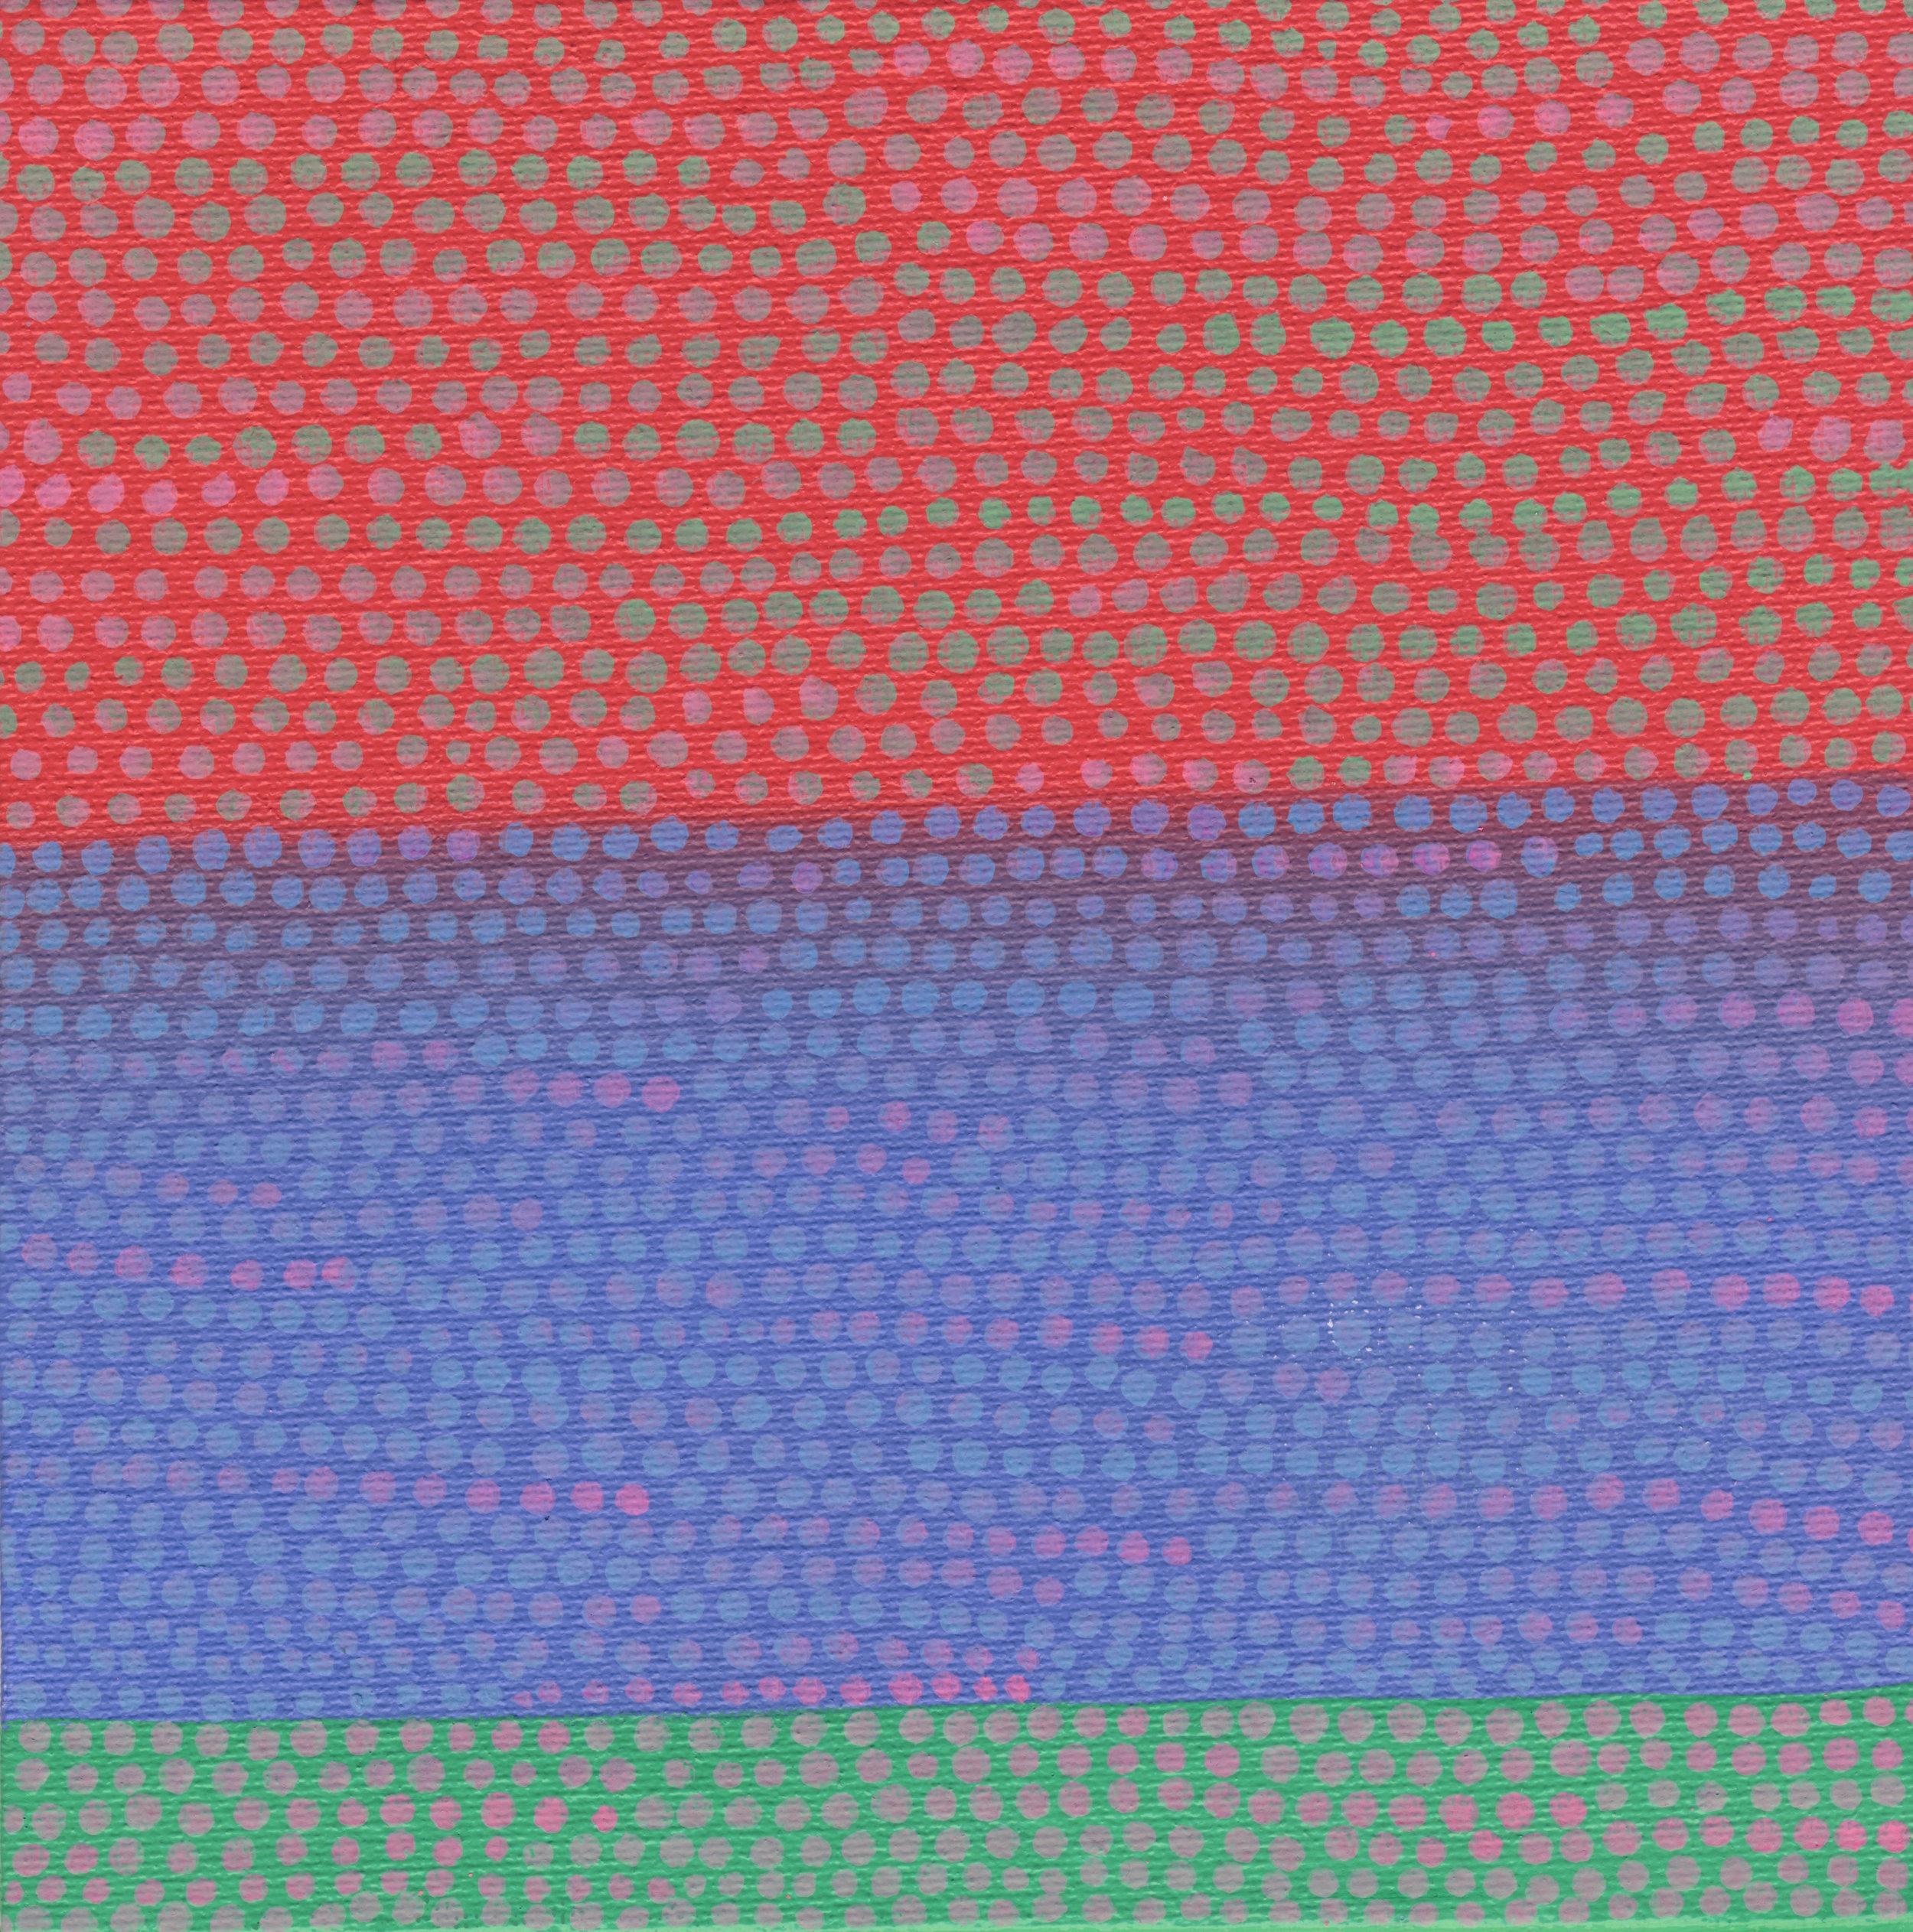 "82/100, Acrylic on canvas panel, 6"" X 6"", 3/29/19"